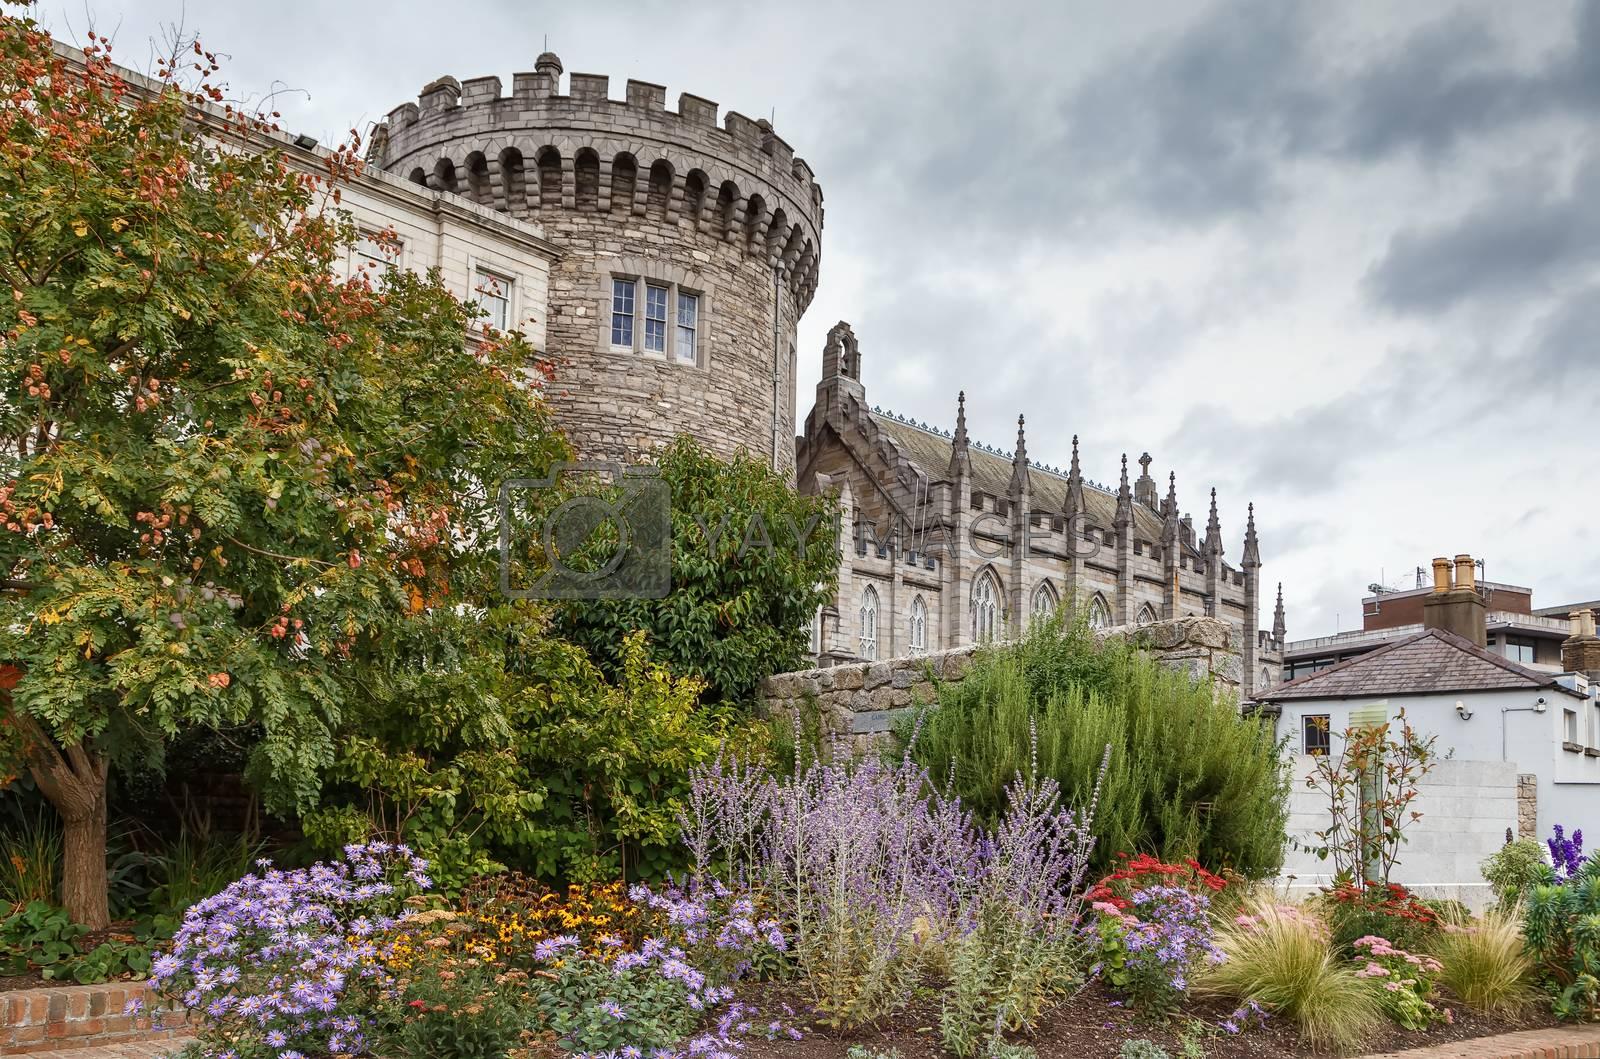 Royalty free image of Record Tower, Dublin, Ireland by borisb17